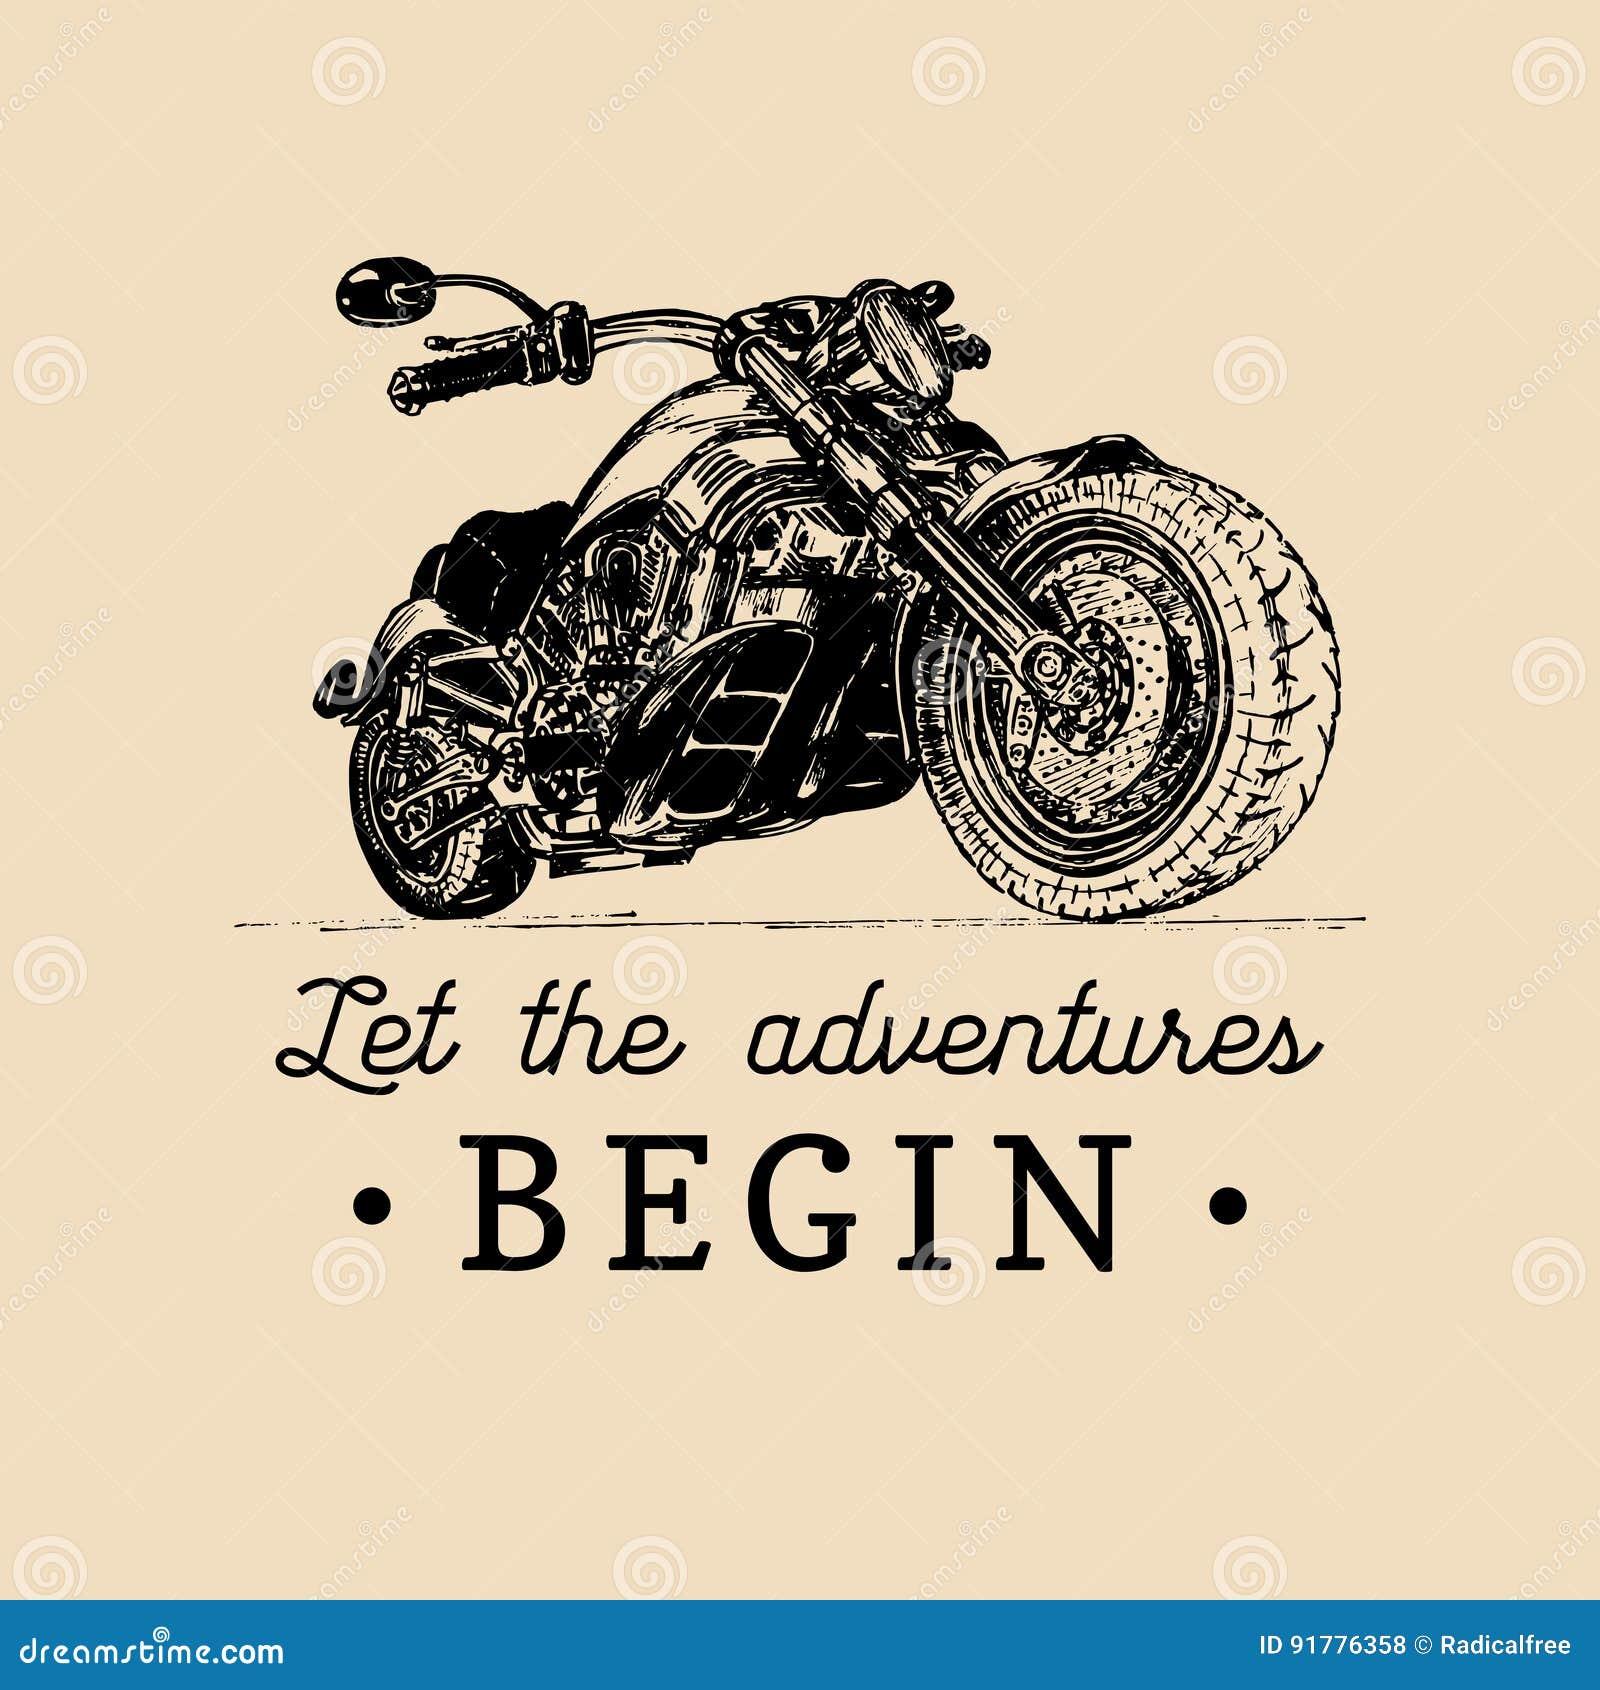 Let the adventures begin inspirational poster. Vector hand drawn motorcycle for MC label. Vintage bike illustration.